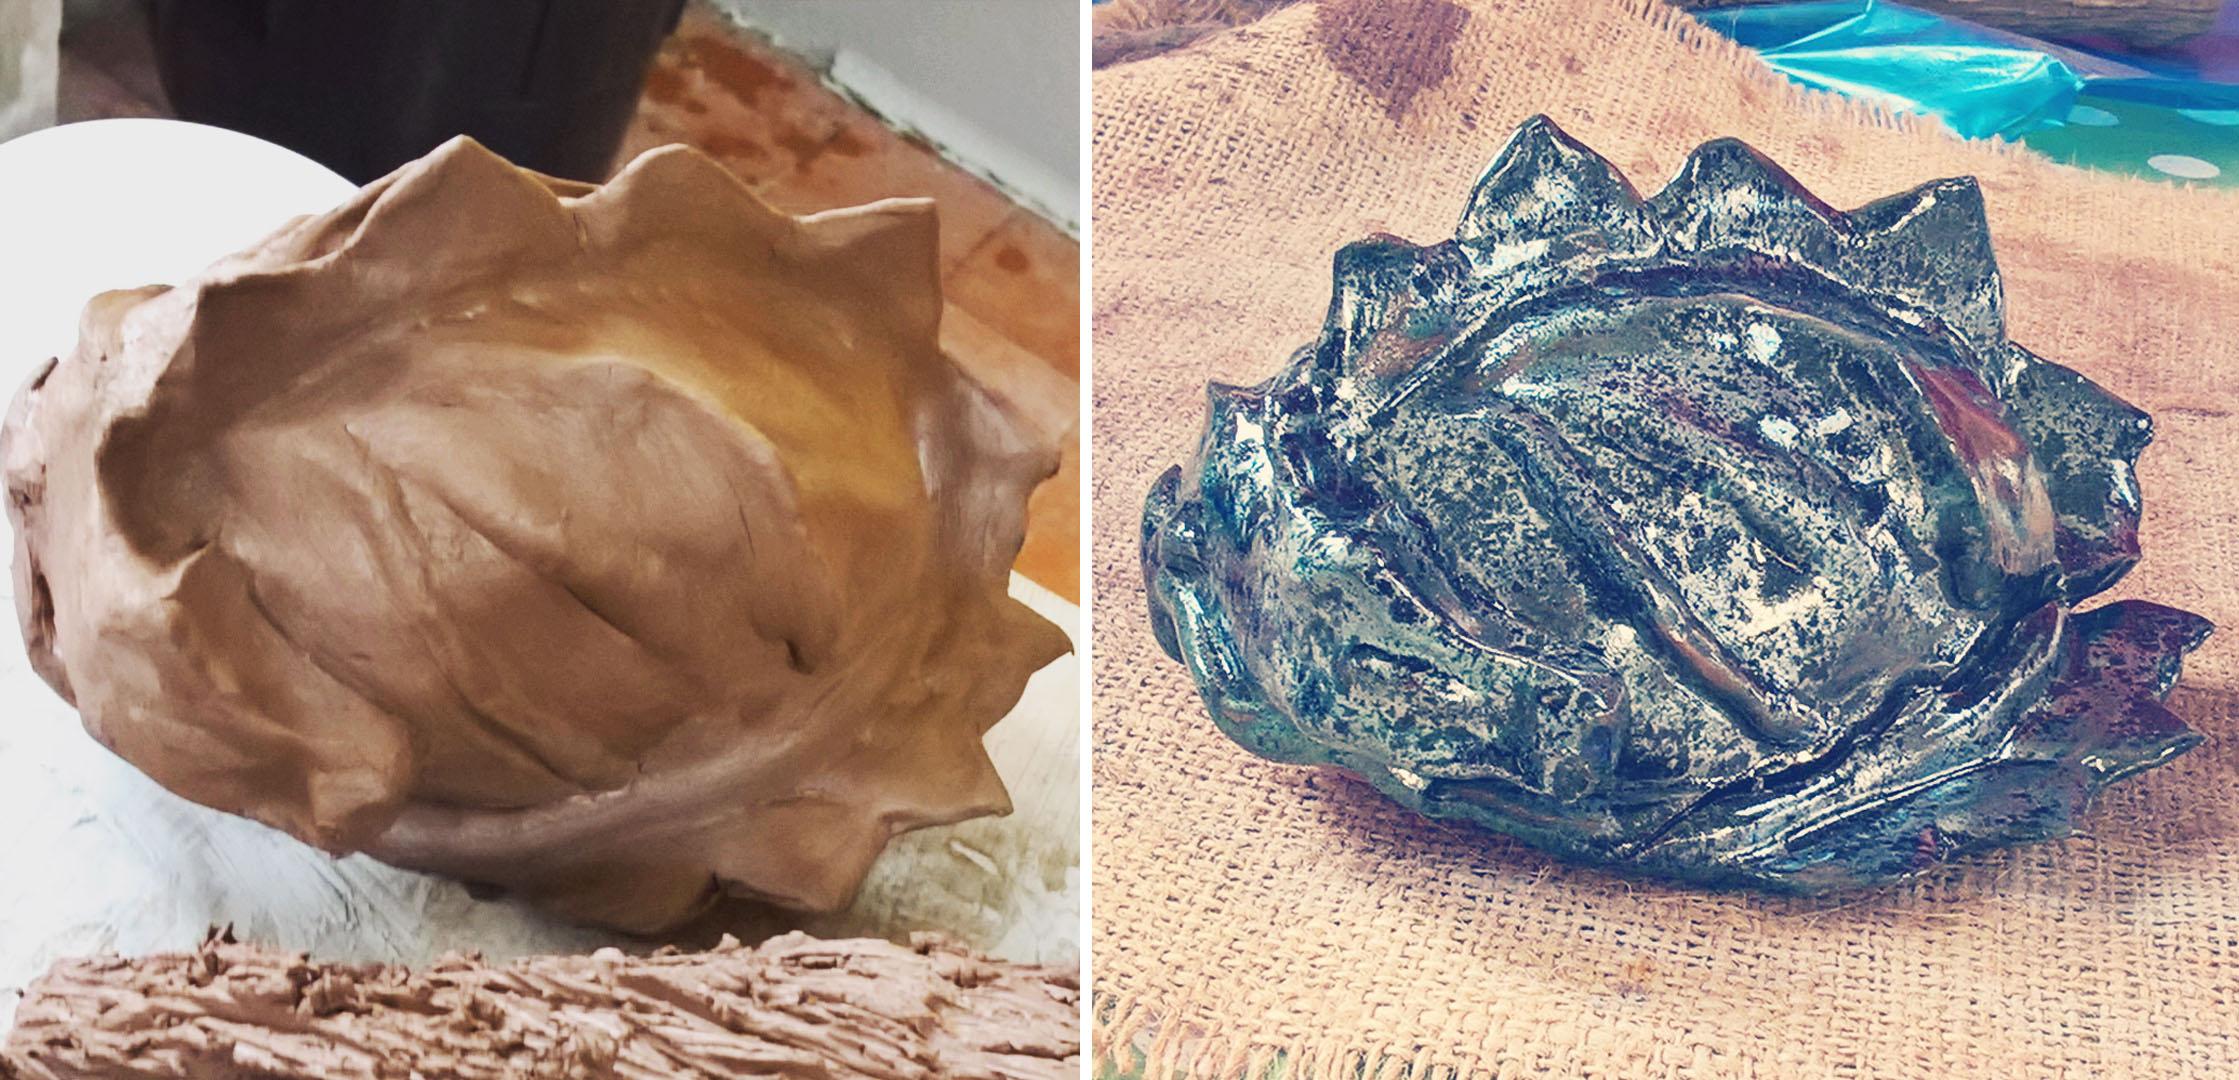 clay-and-glazed-sleeping-dragon-pinchpot-work-lisa-shambrook-greenspace-carers-sept-2016